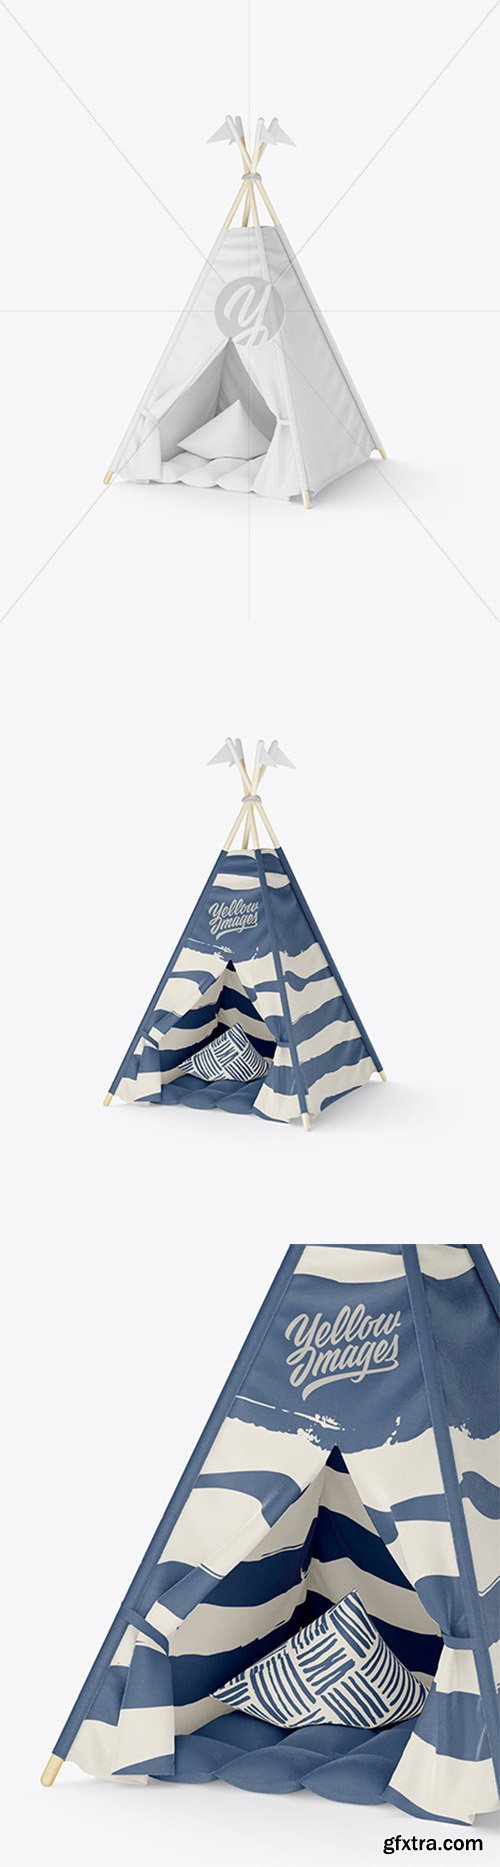 Kids Teepee Tent with Mat Mockup 66106